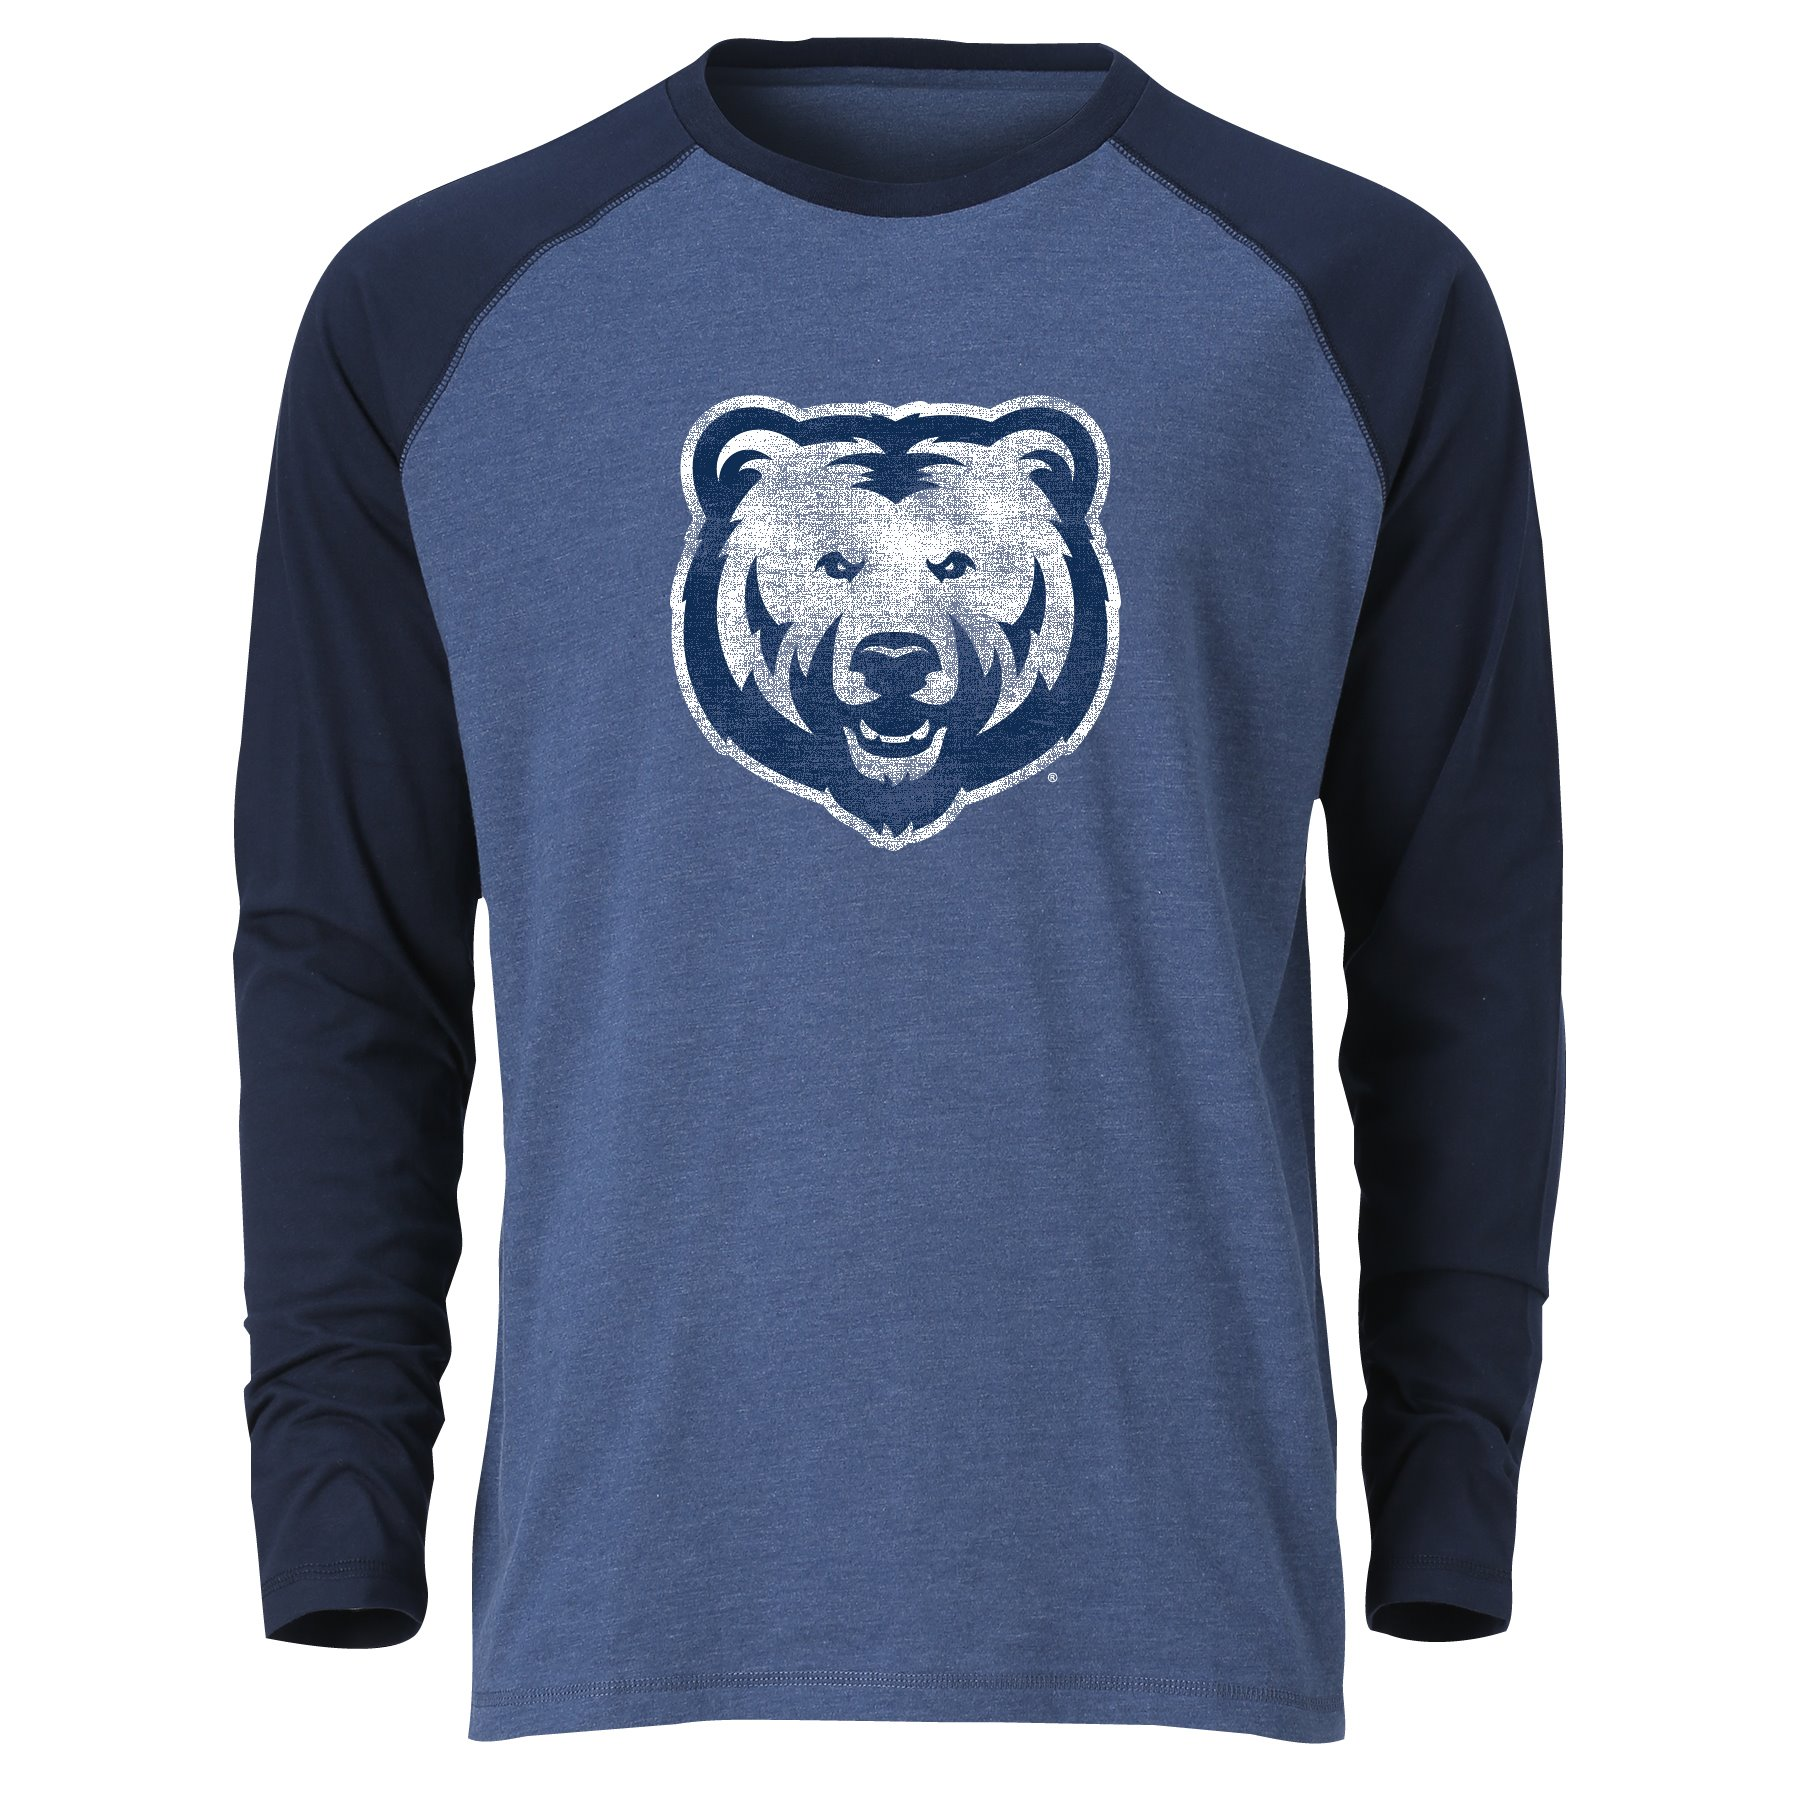 Men's Baseball Long Sleeve Shirt